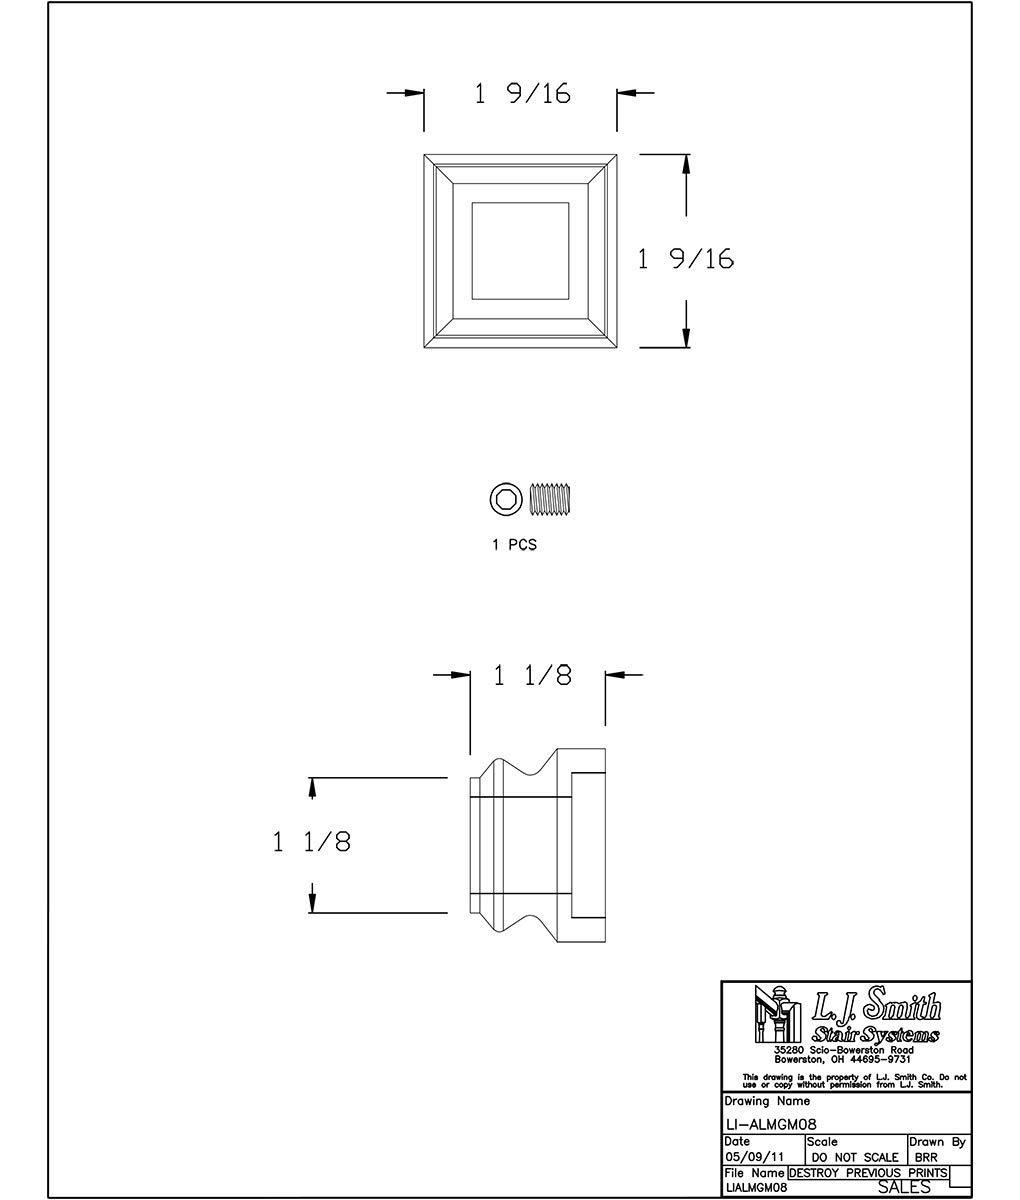 LI-ALMGM08-MB: Aluminum Level Shoe for 3/4'' Hollow Square Aluminum Balusters (Matte Black)